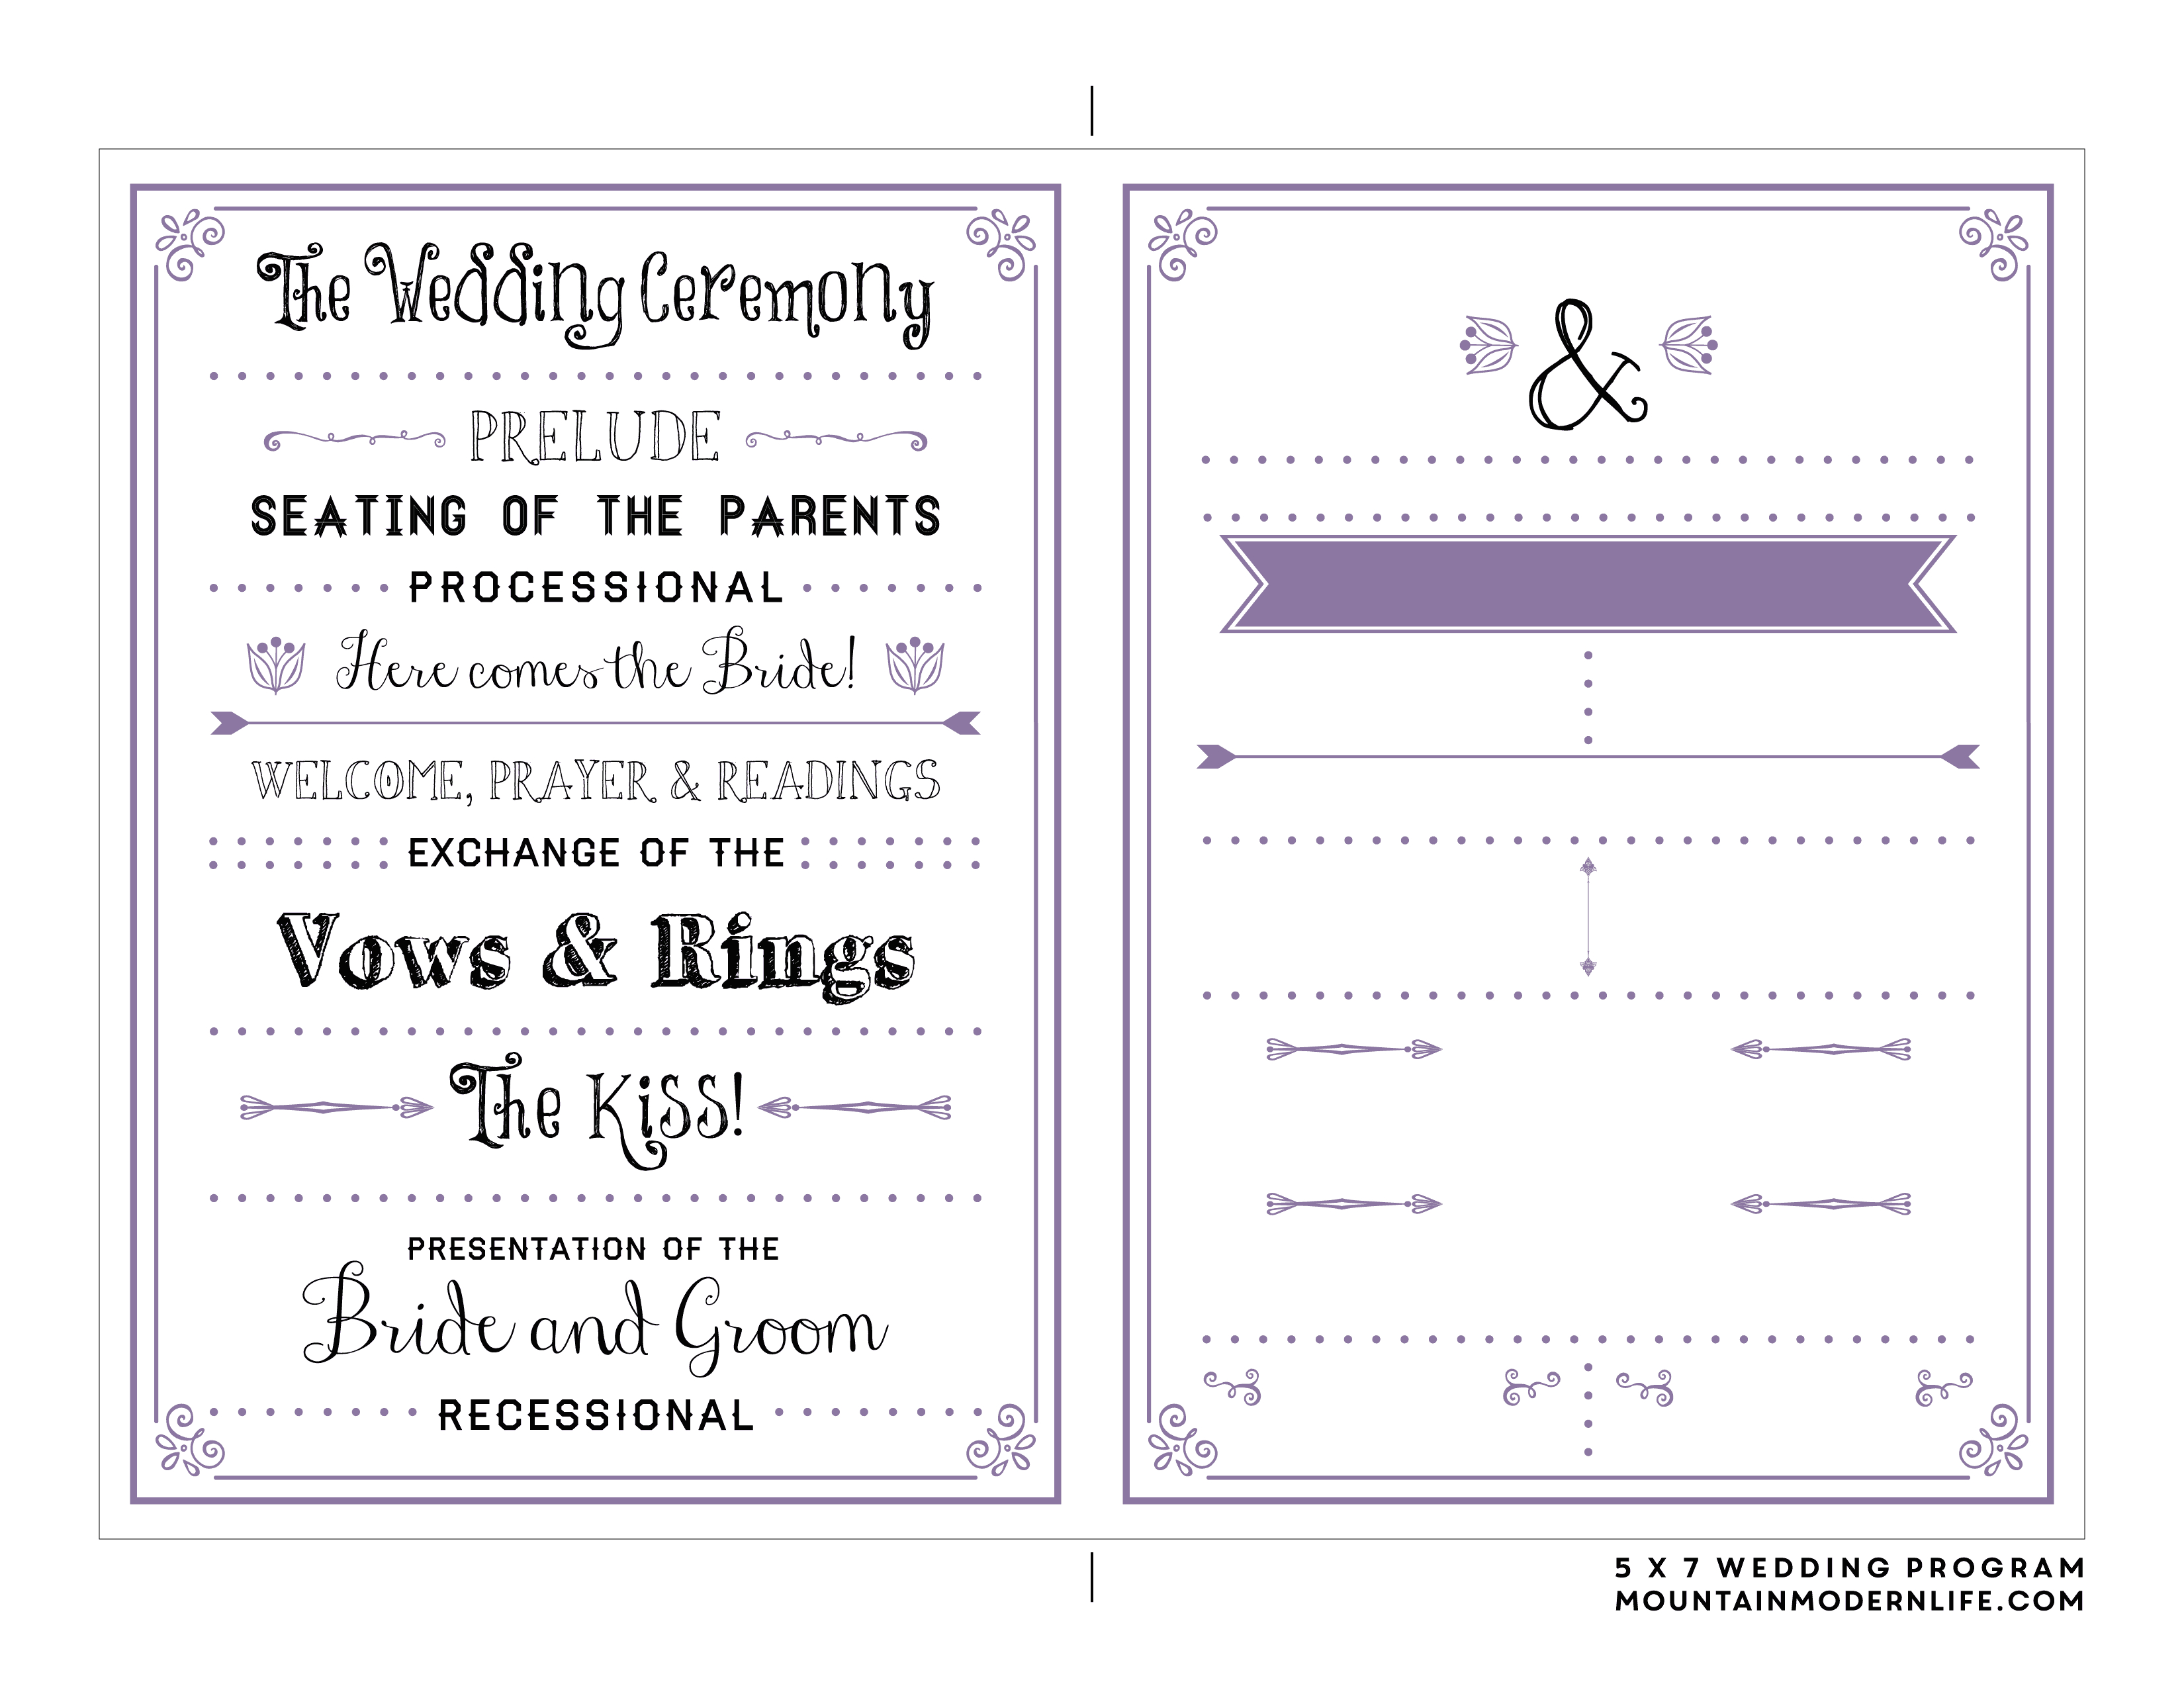 Free Printable Wedding Program | Mountainmodernlife - Free Printable Fan Wedding Programs